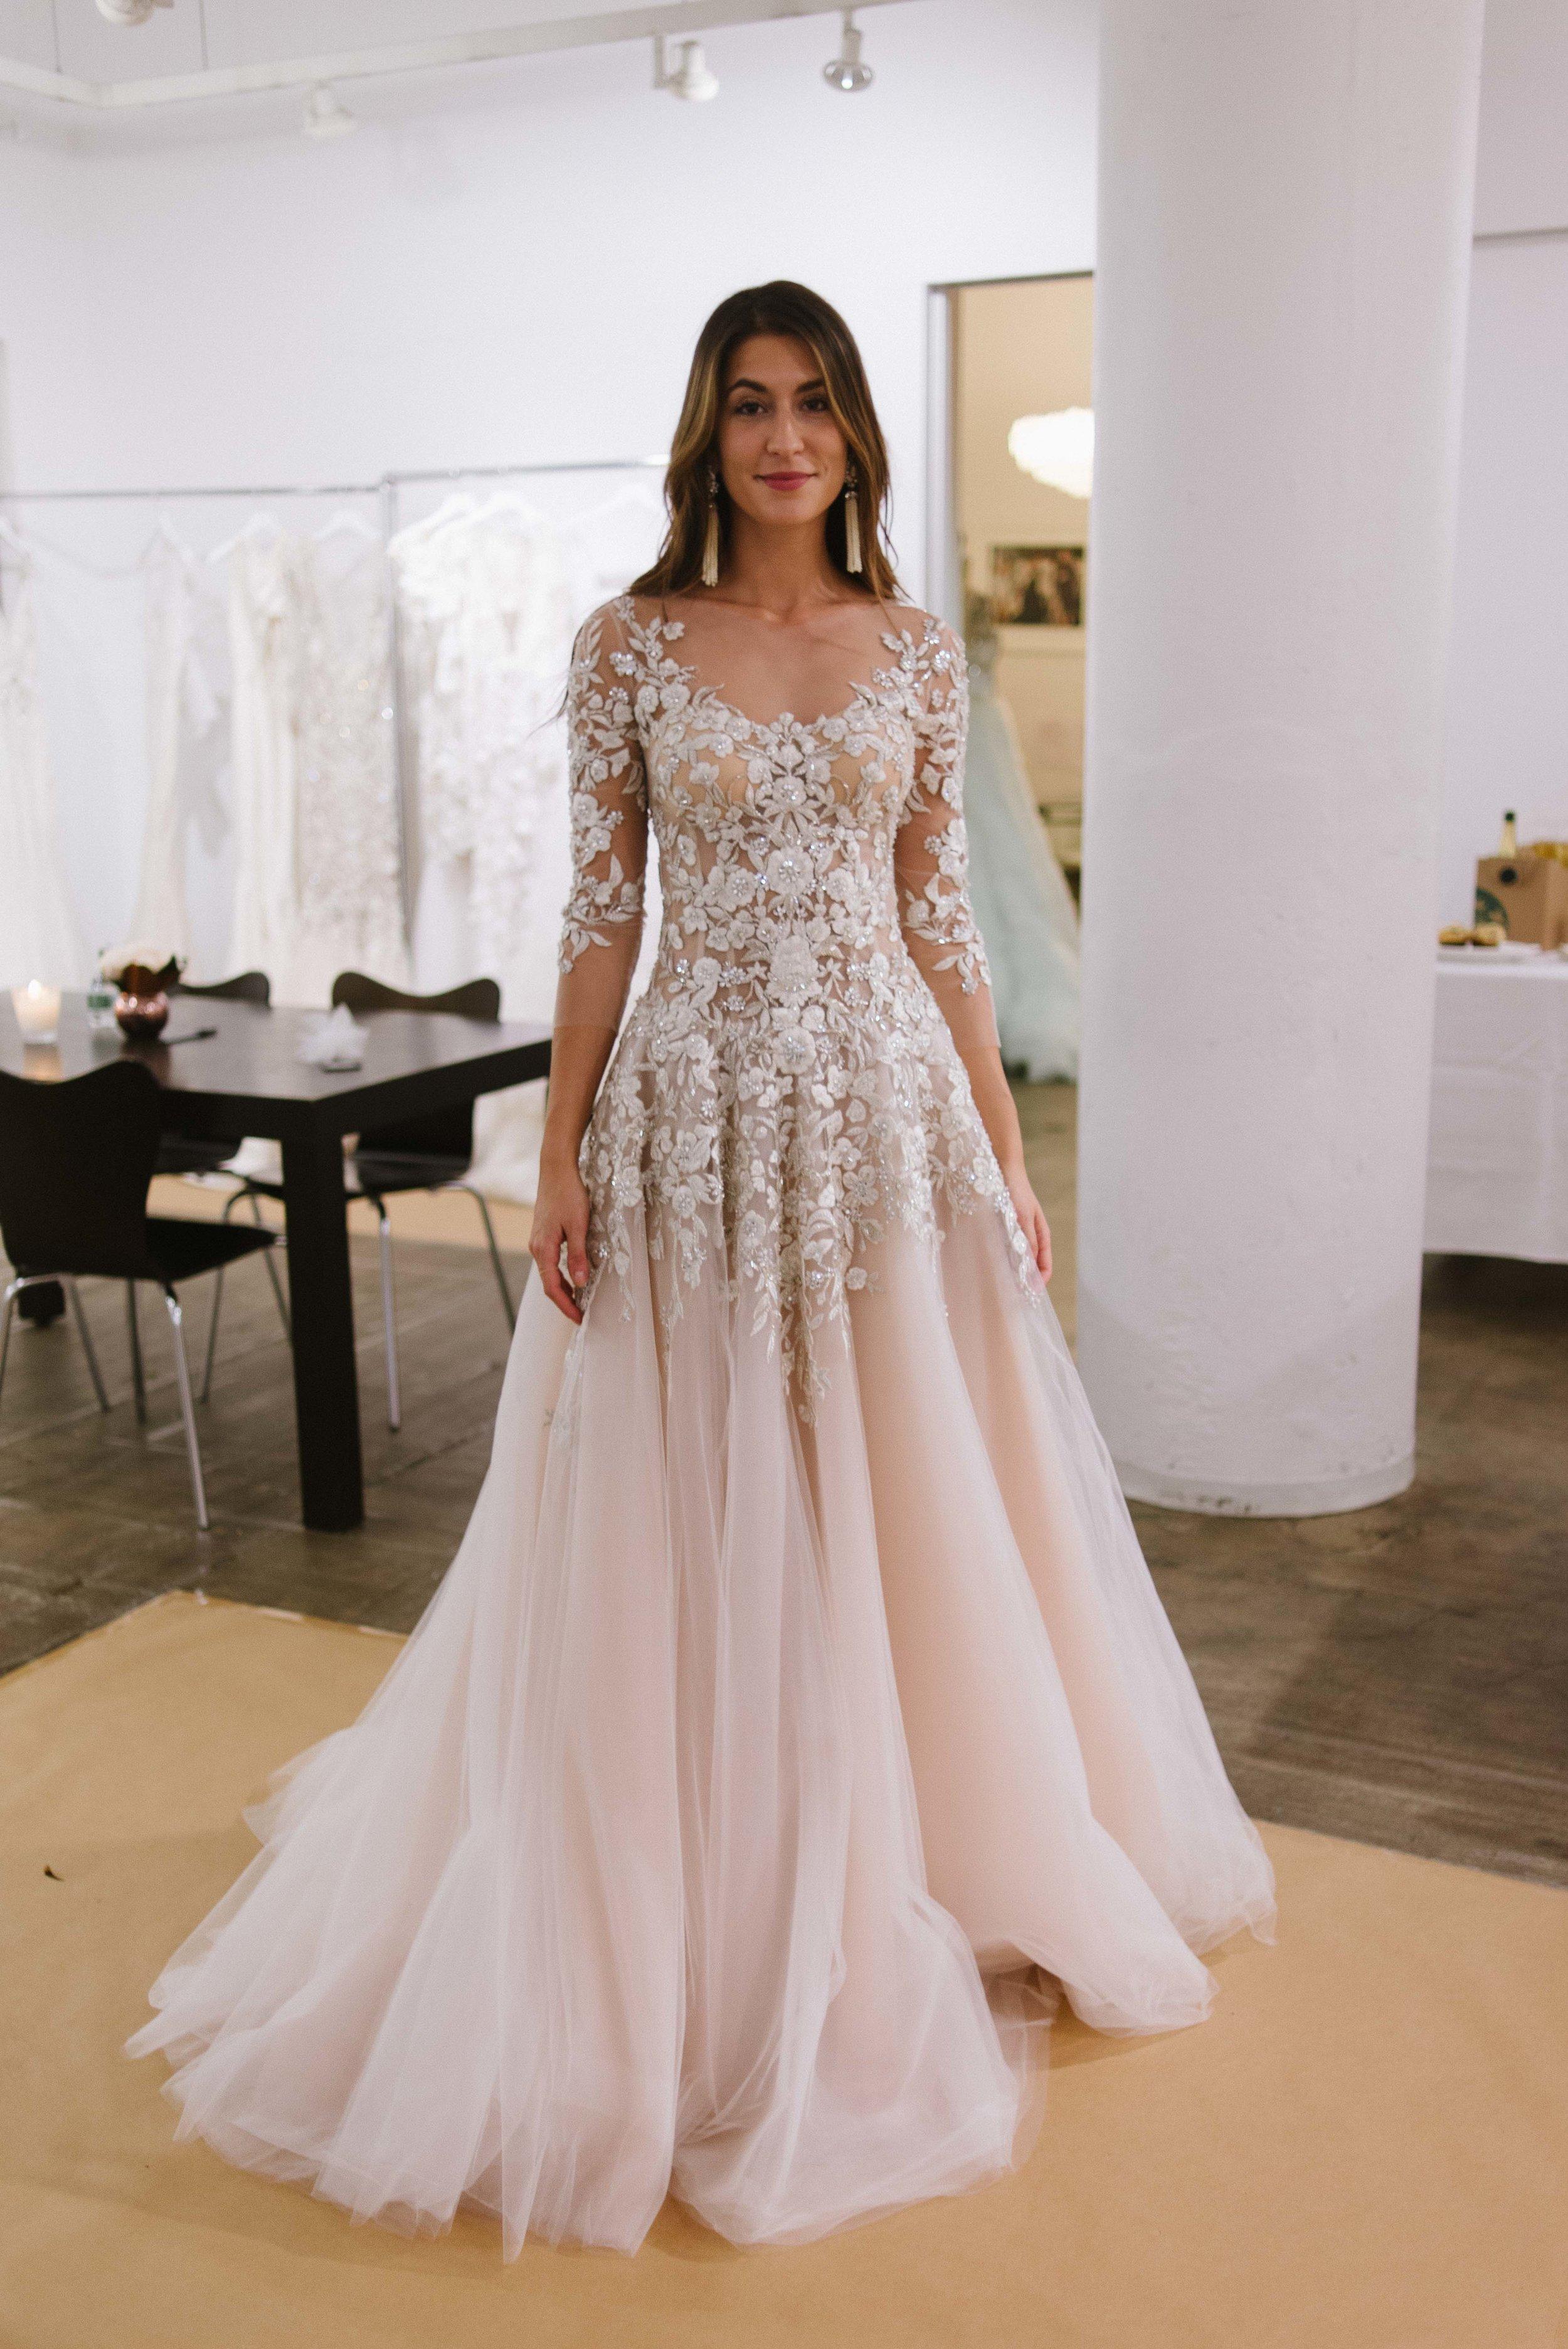 New York Bridal Fashion Week 2016 | Marchesa | Little White Dress Bridal Shop in Denver